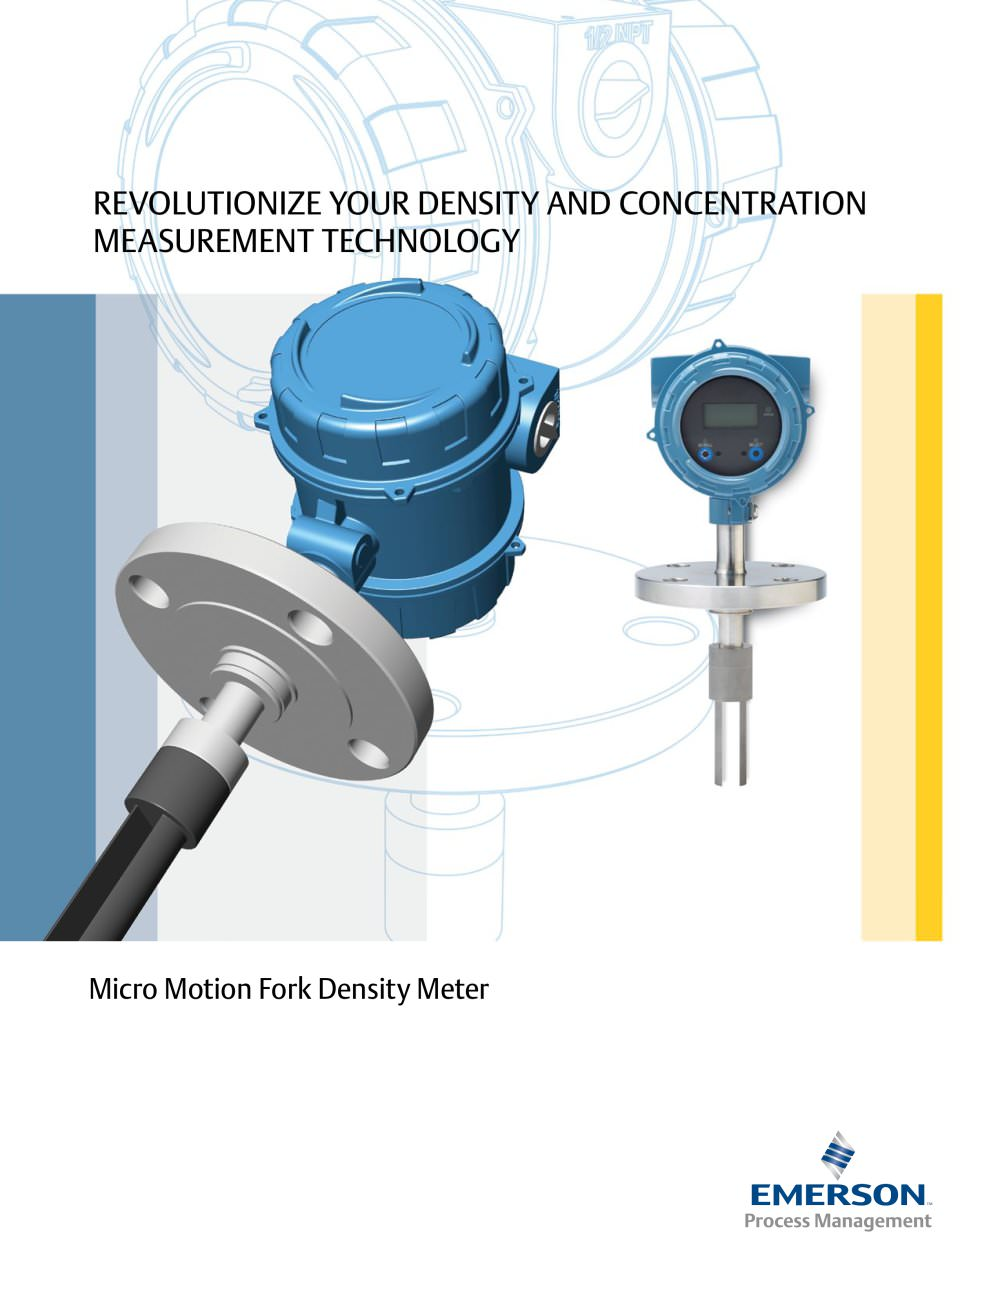 Micro Motion Wiring Diagram Manual C4 Corvette Engine Flywheel Schematic Building